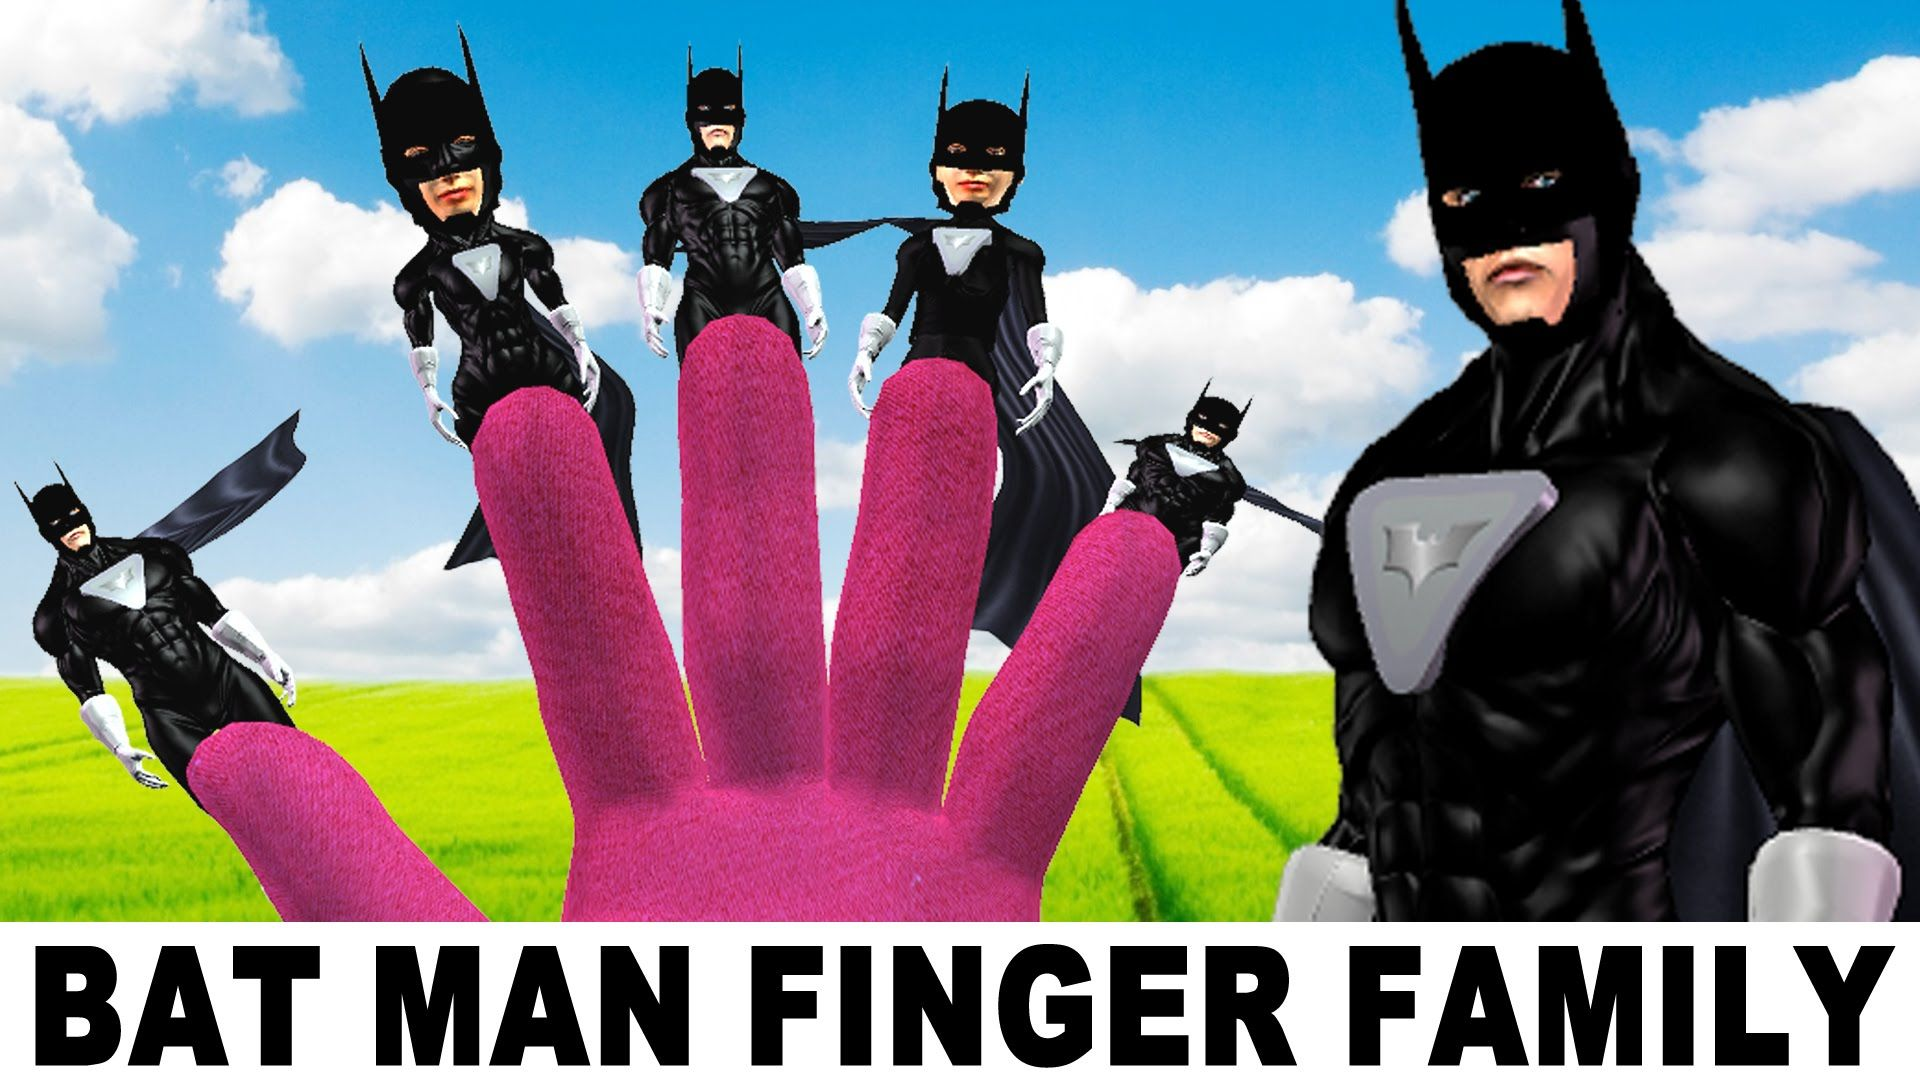 Batman Vs Hulk SuperHeros in Action | 3D Cartoon Animation Finger Family...